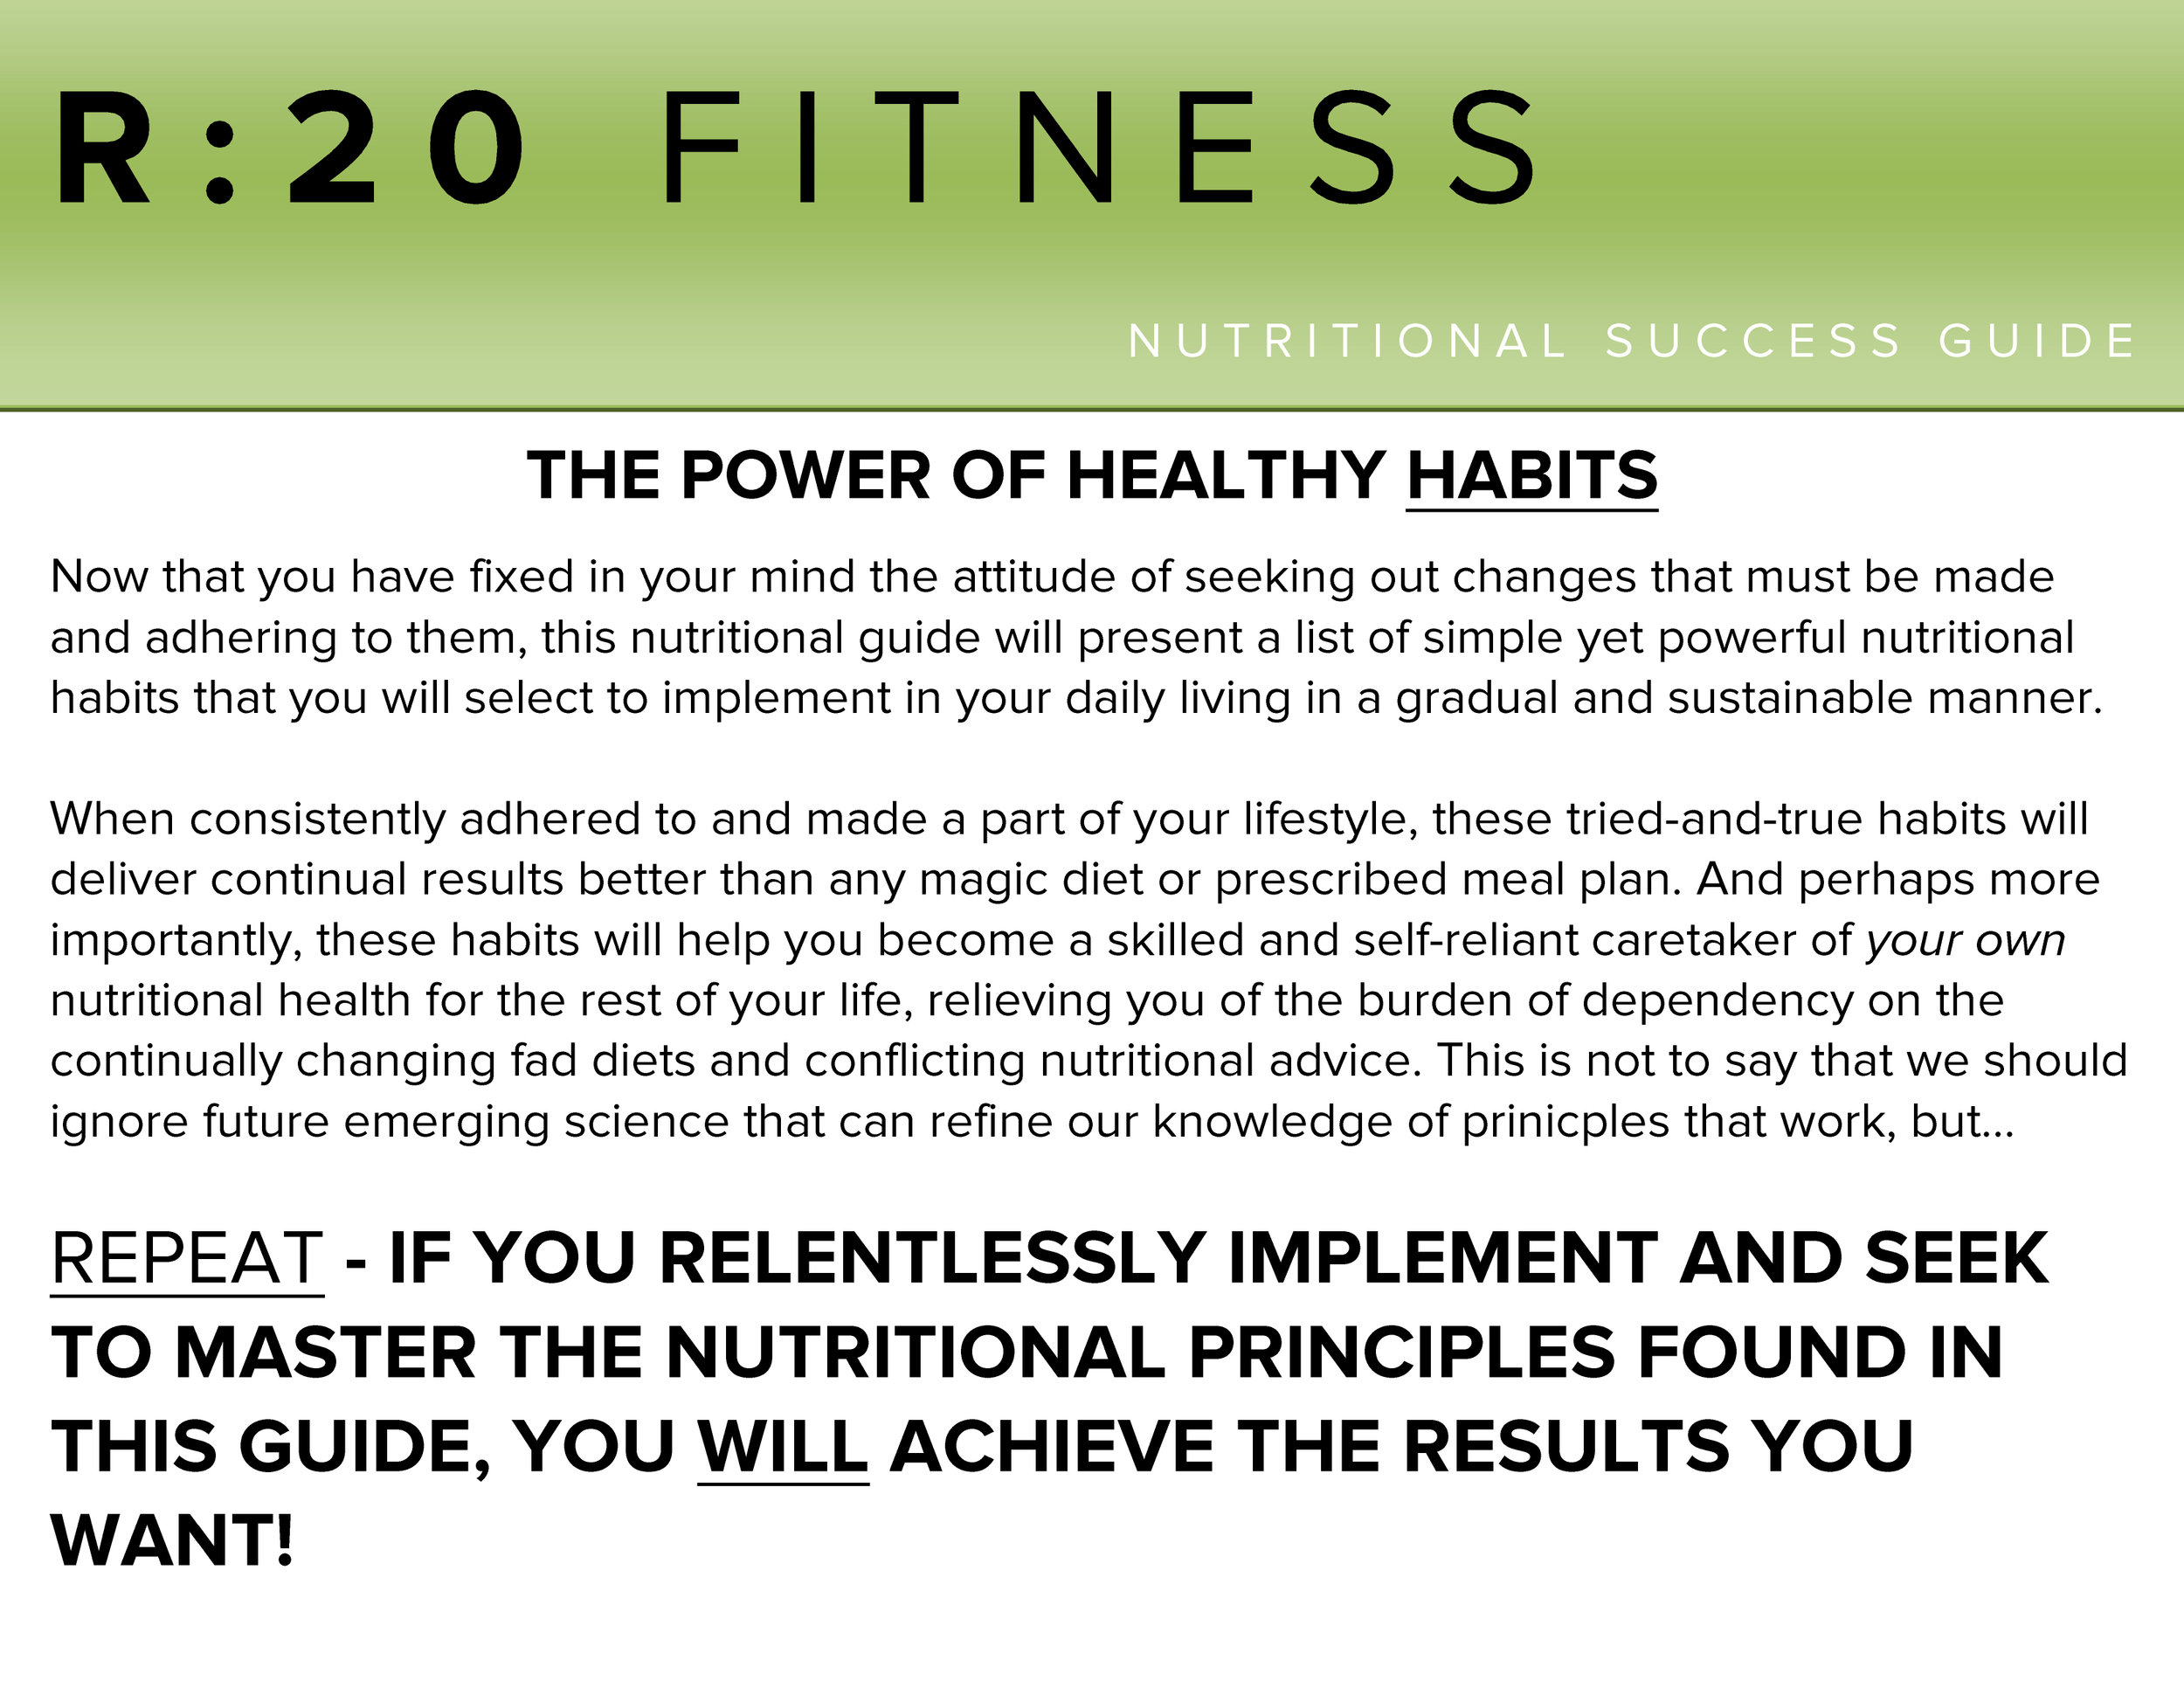 R20 1.0 Nutritional Success Guide-2.jpg